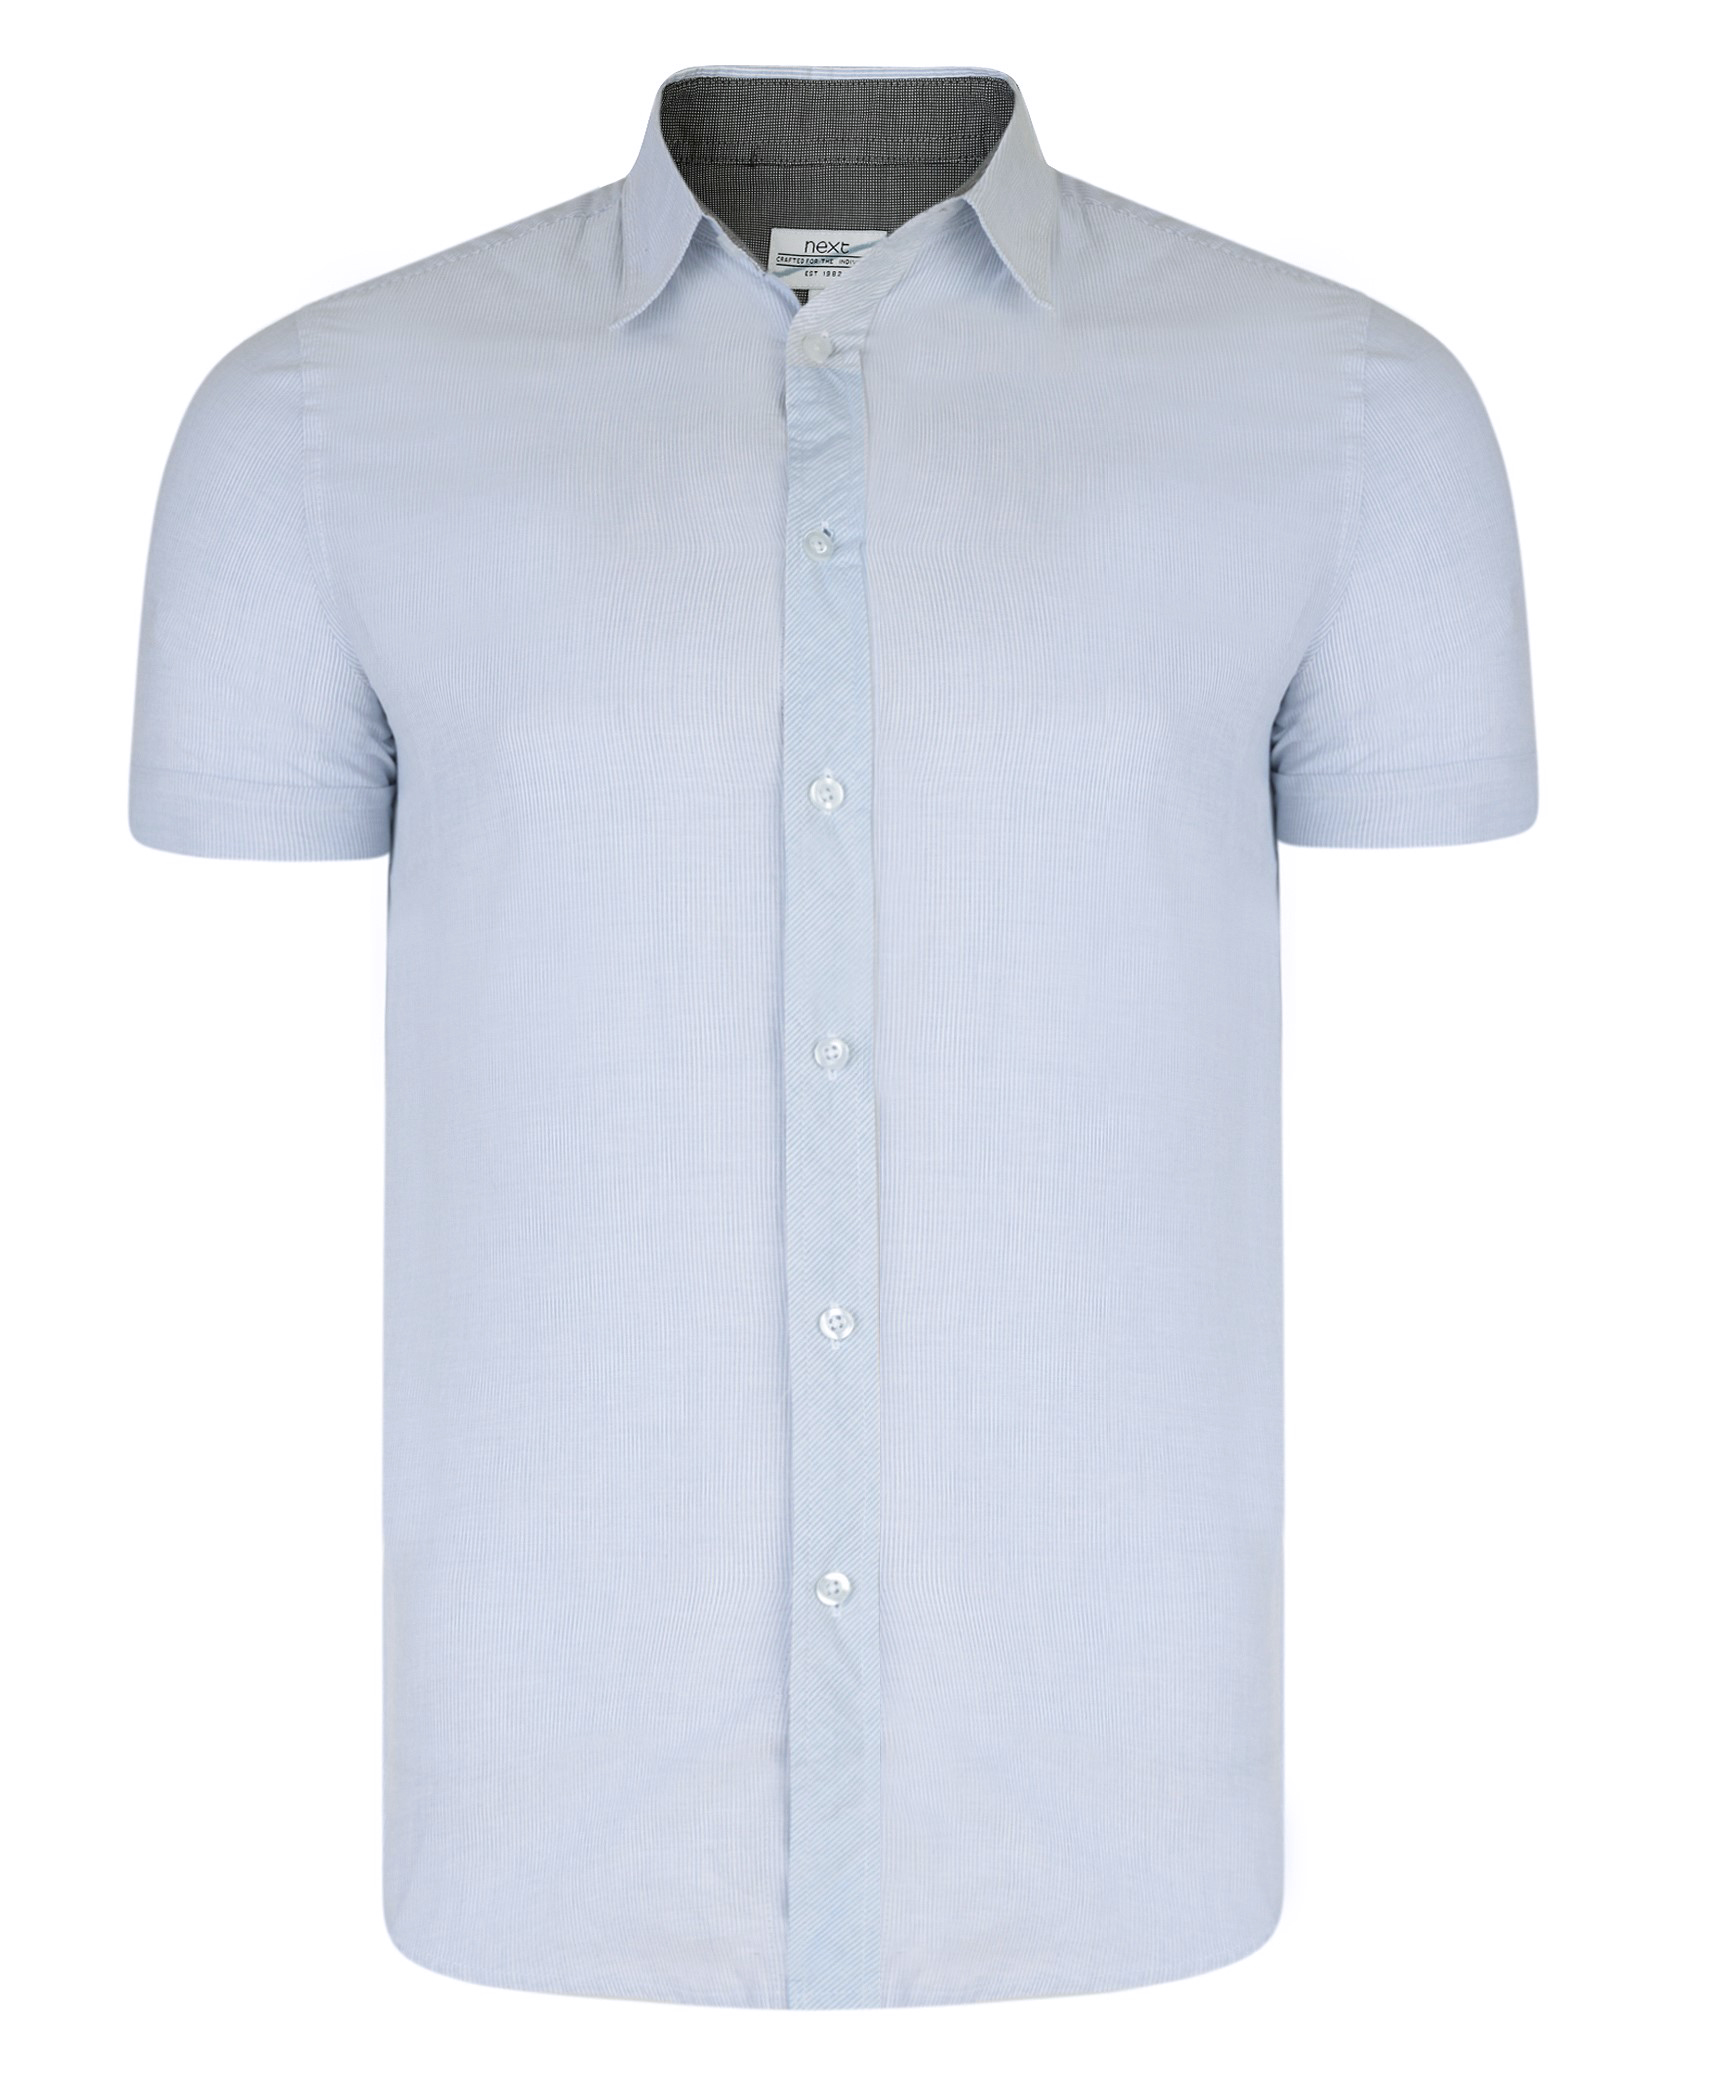 Mens Short Sleeve Ex Next Shirt In Pinstripe Light Blue